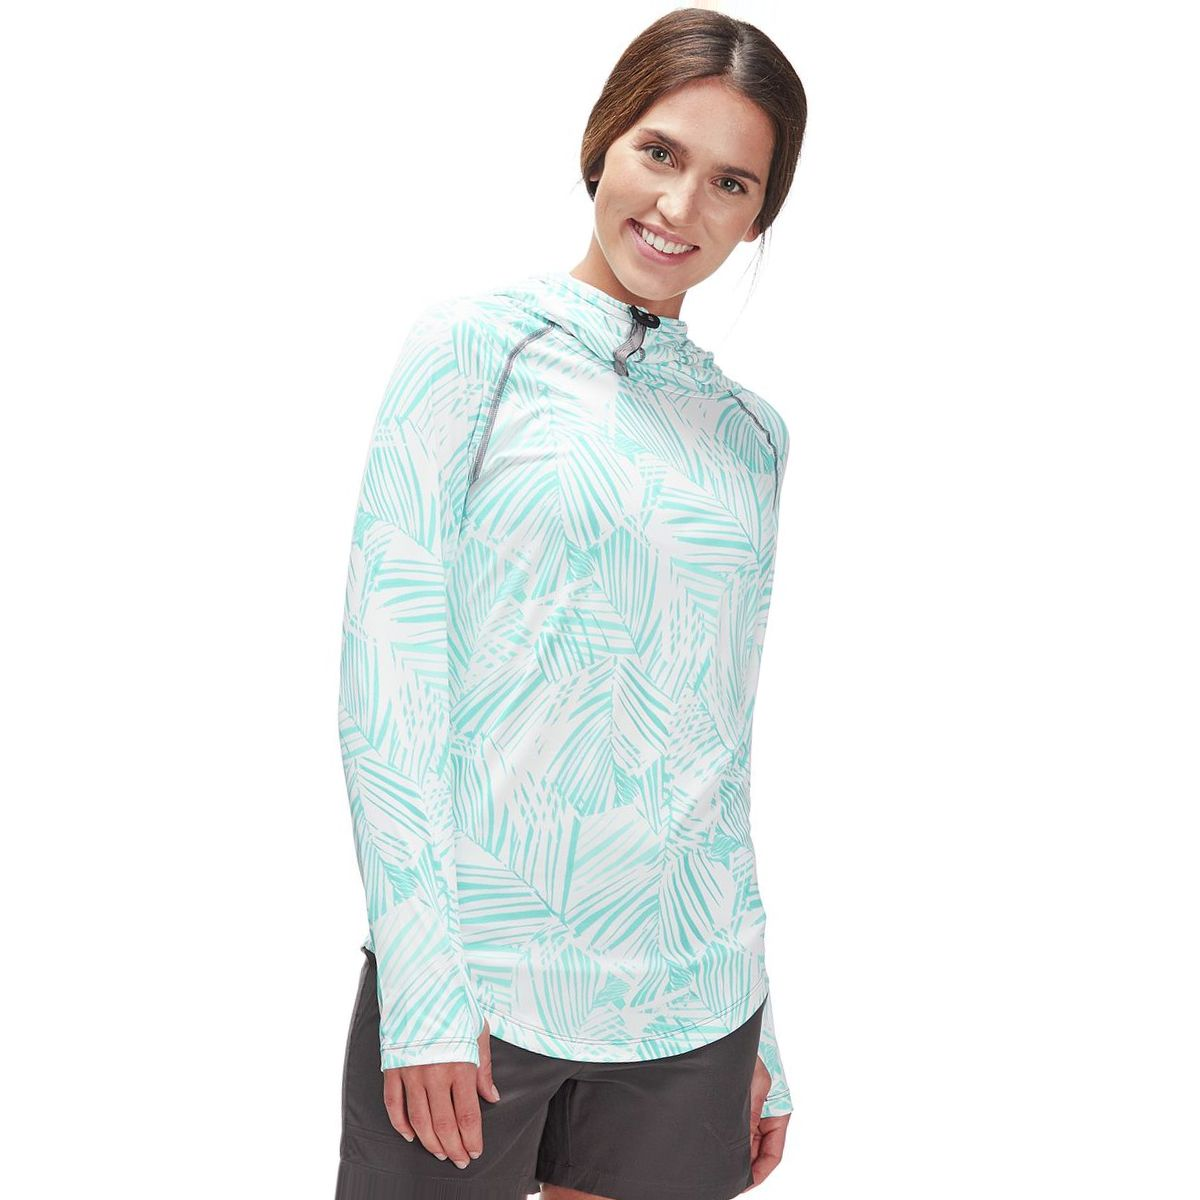 Patagonia Tropic Comfort Hooded Shirt - Women's